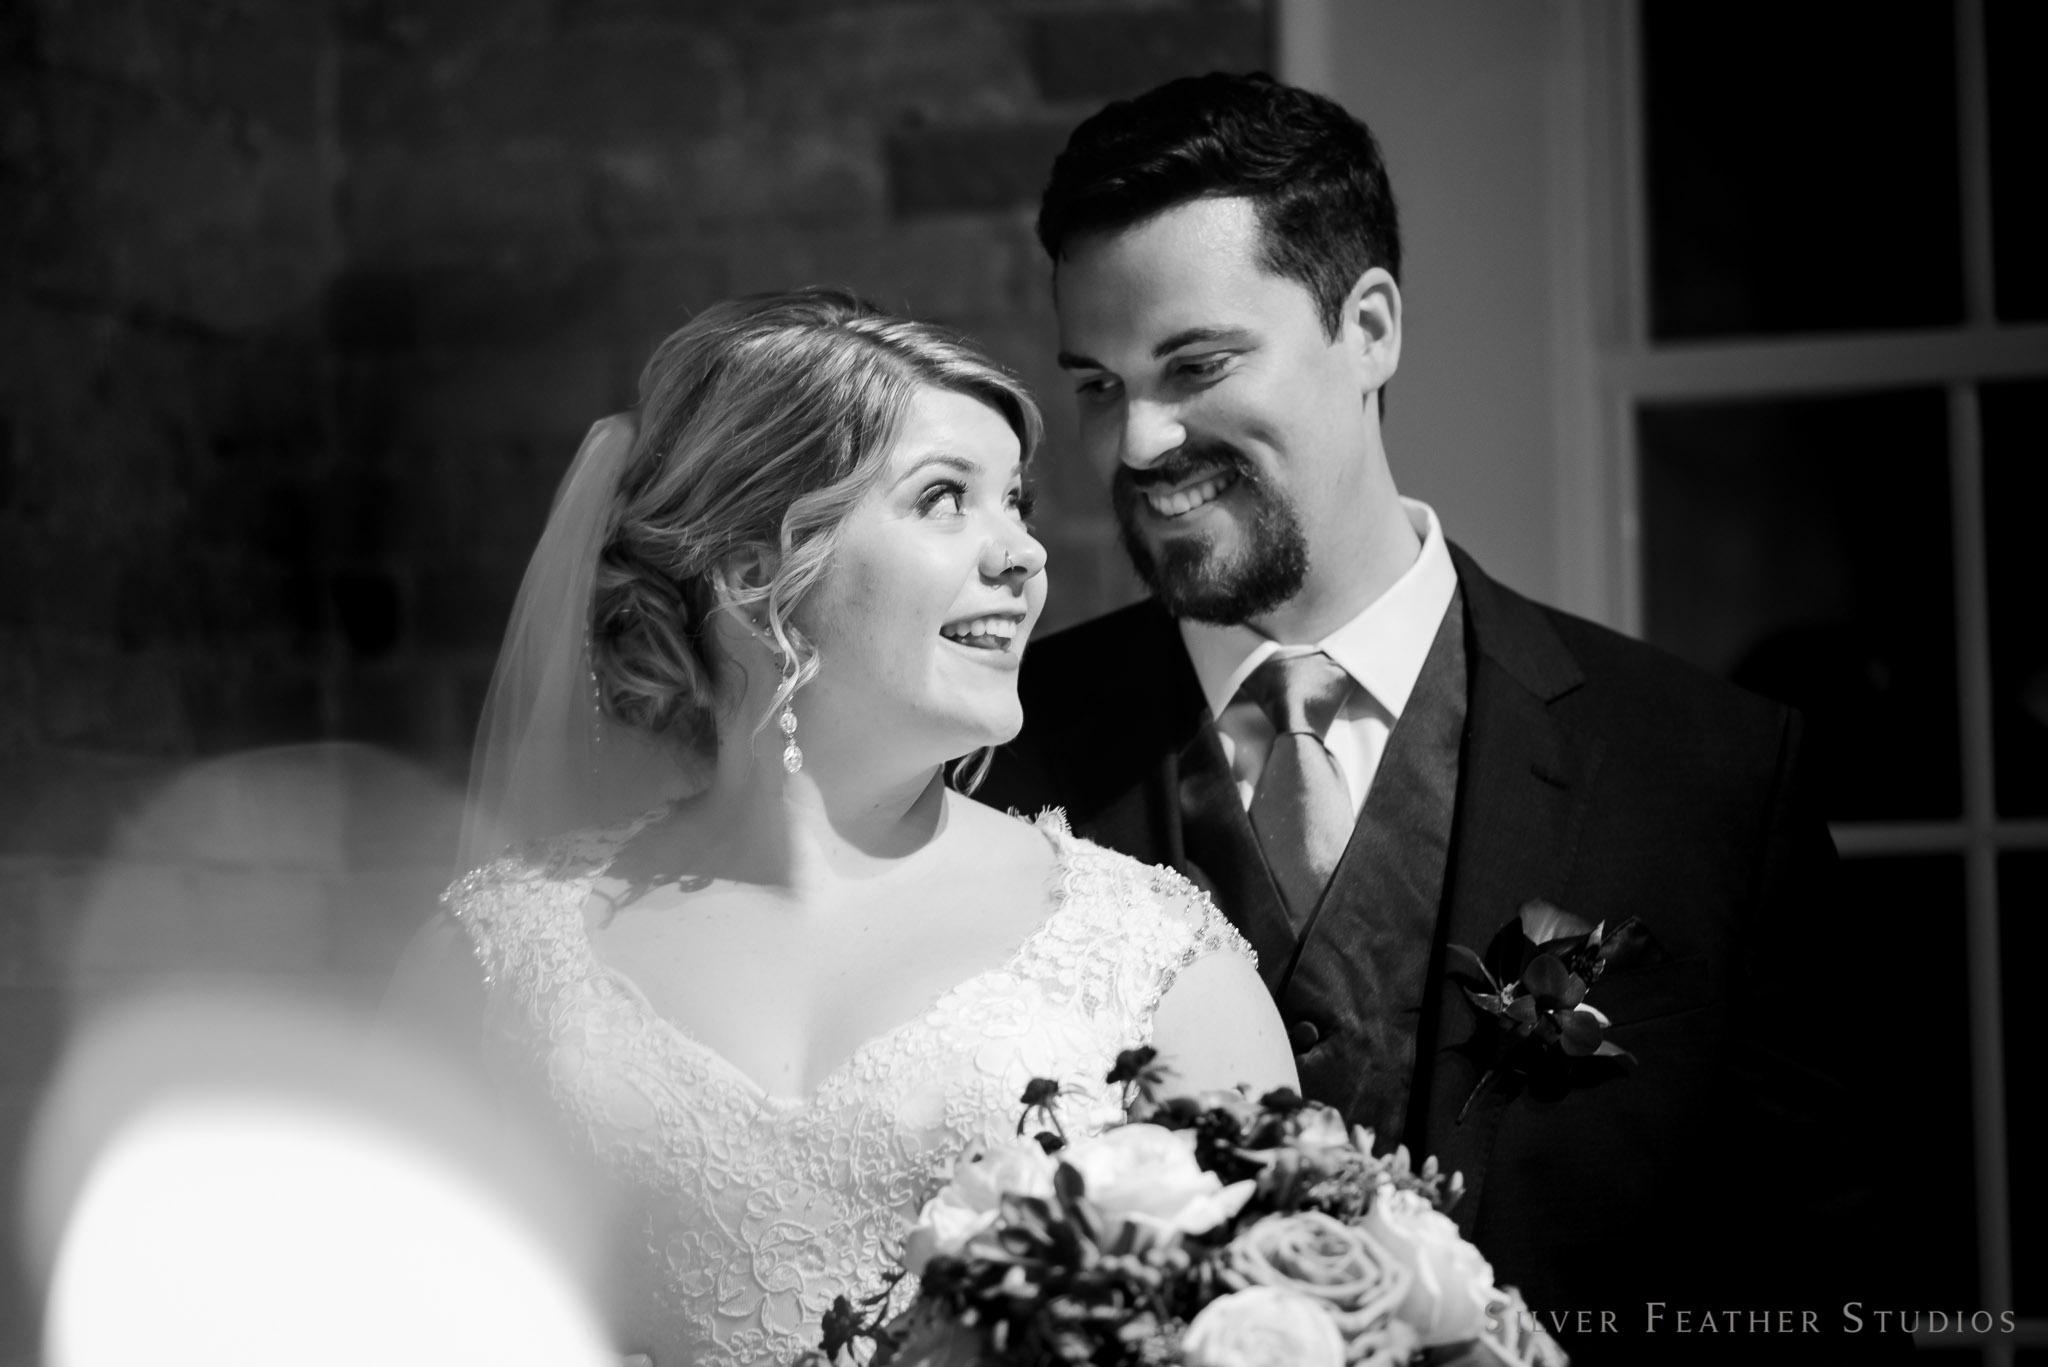 cottom-room-wedding-photography-037.jpg